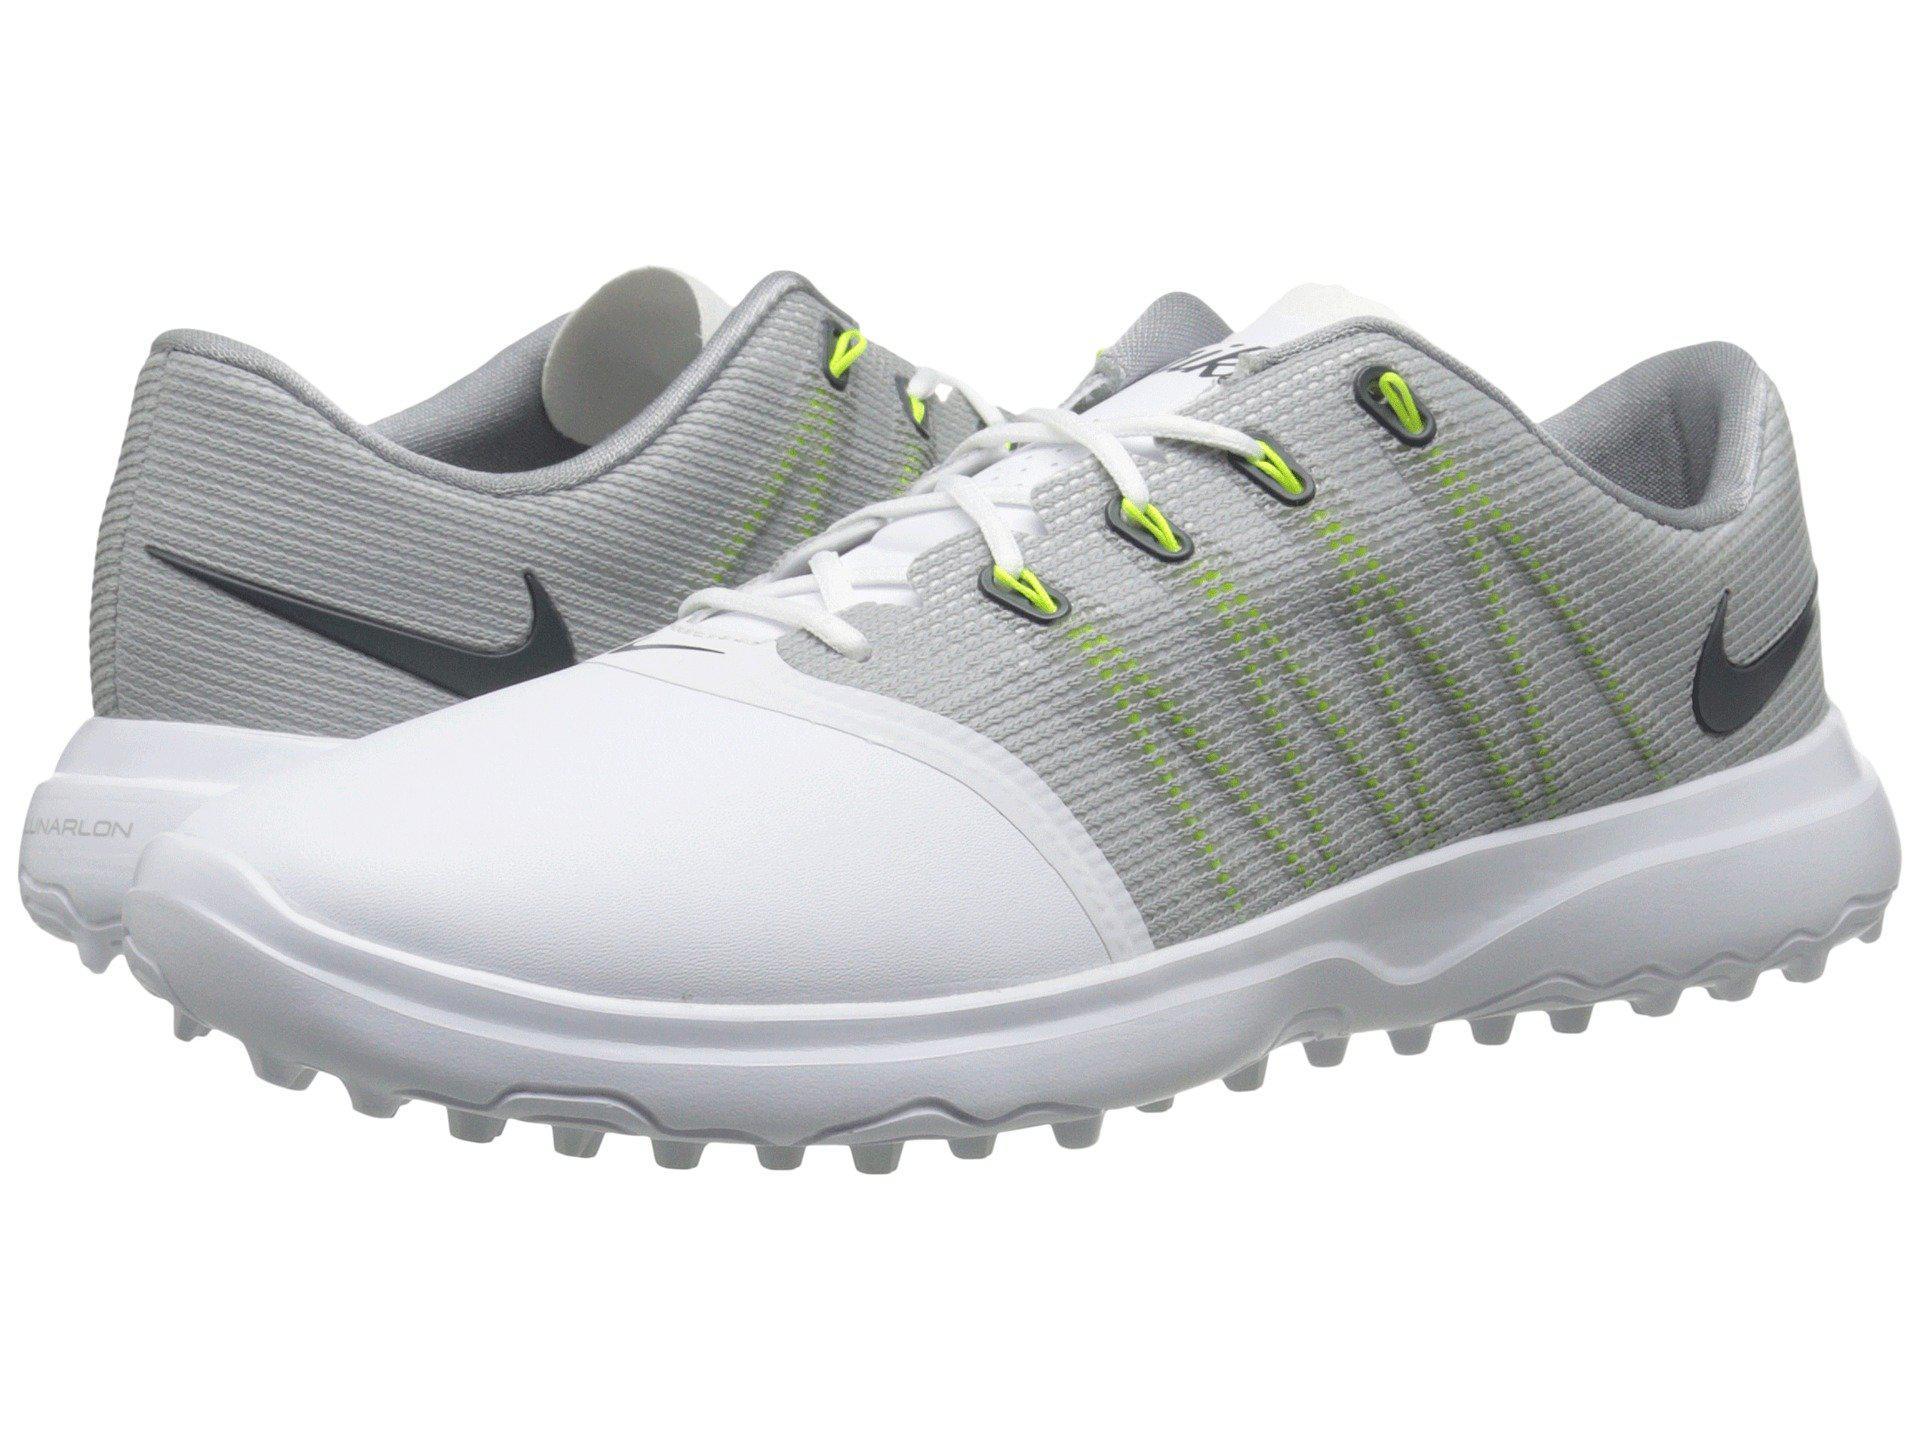 09c44154bf06 Lyst - Nike Lunar Empress 2 (white anthracite cool Grey) Women s ...